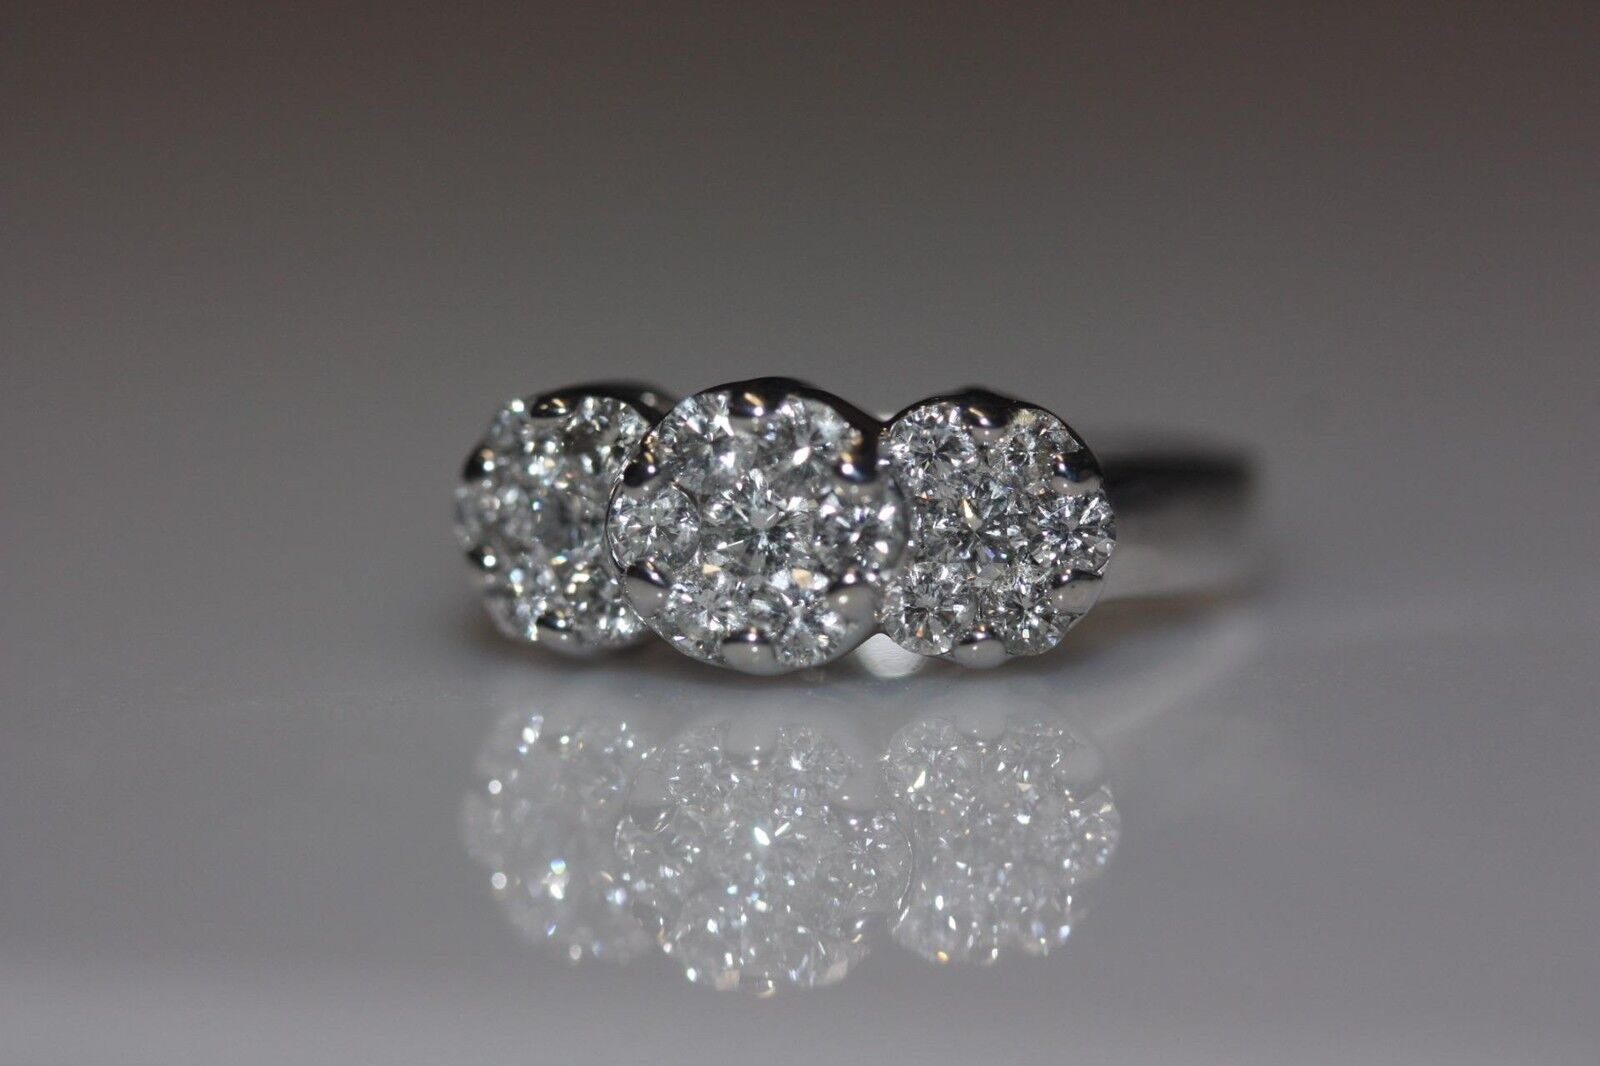 FINE 14K WHITE gold FLOWER CLUSTER DIAMOND RING PAST, PRESENT, FUTURE 1.00 CTW